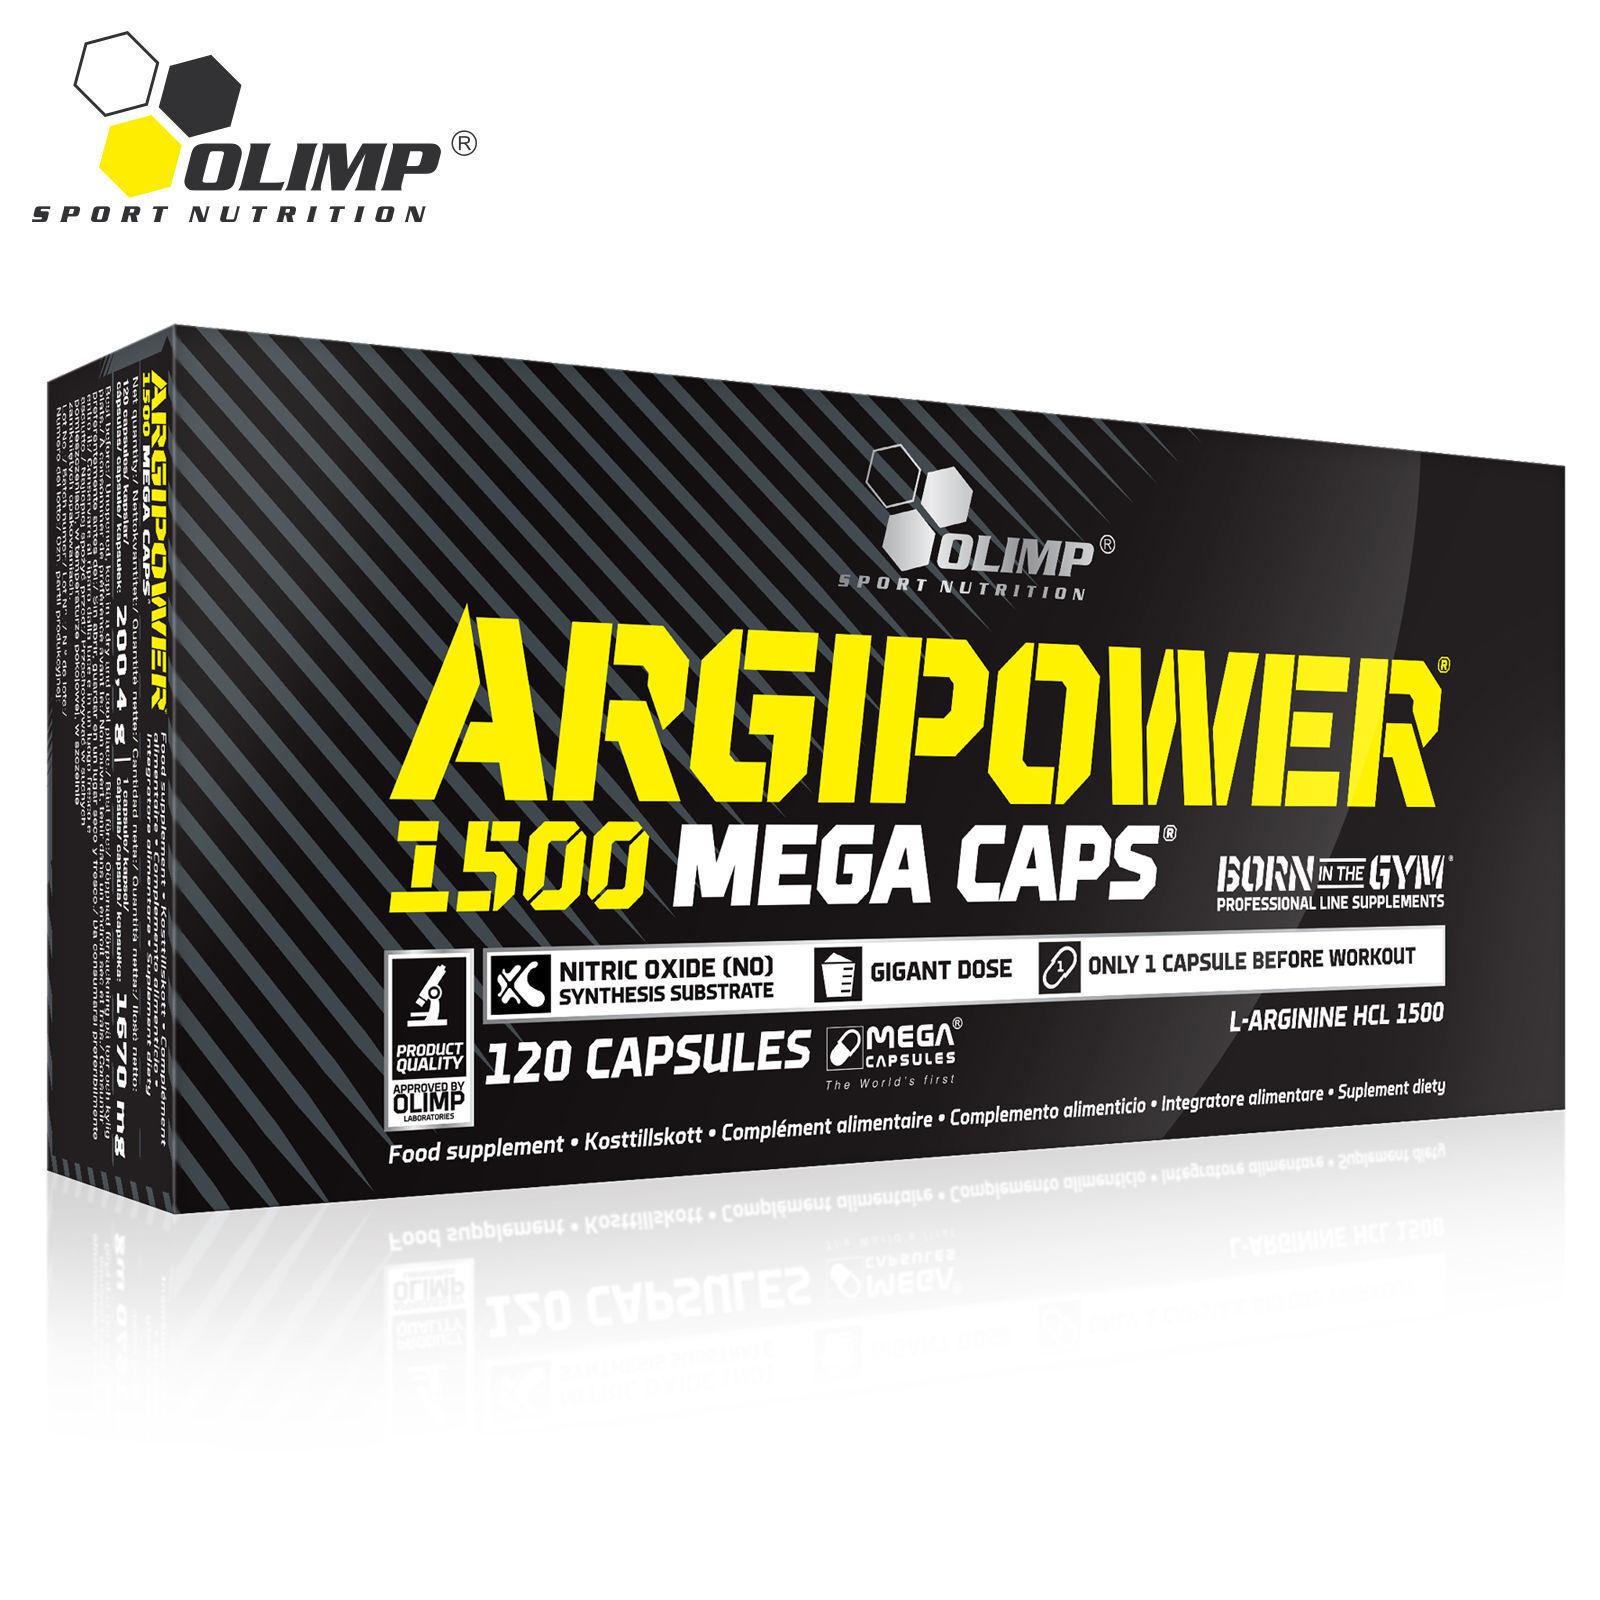 ARGIPOWER BLISTERS L-Arginine Nitric Oxide Muscle Pump & Grow Bodybuilding